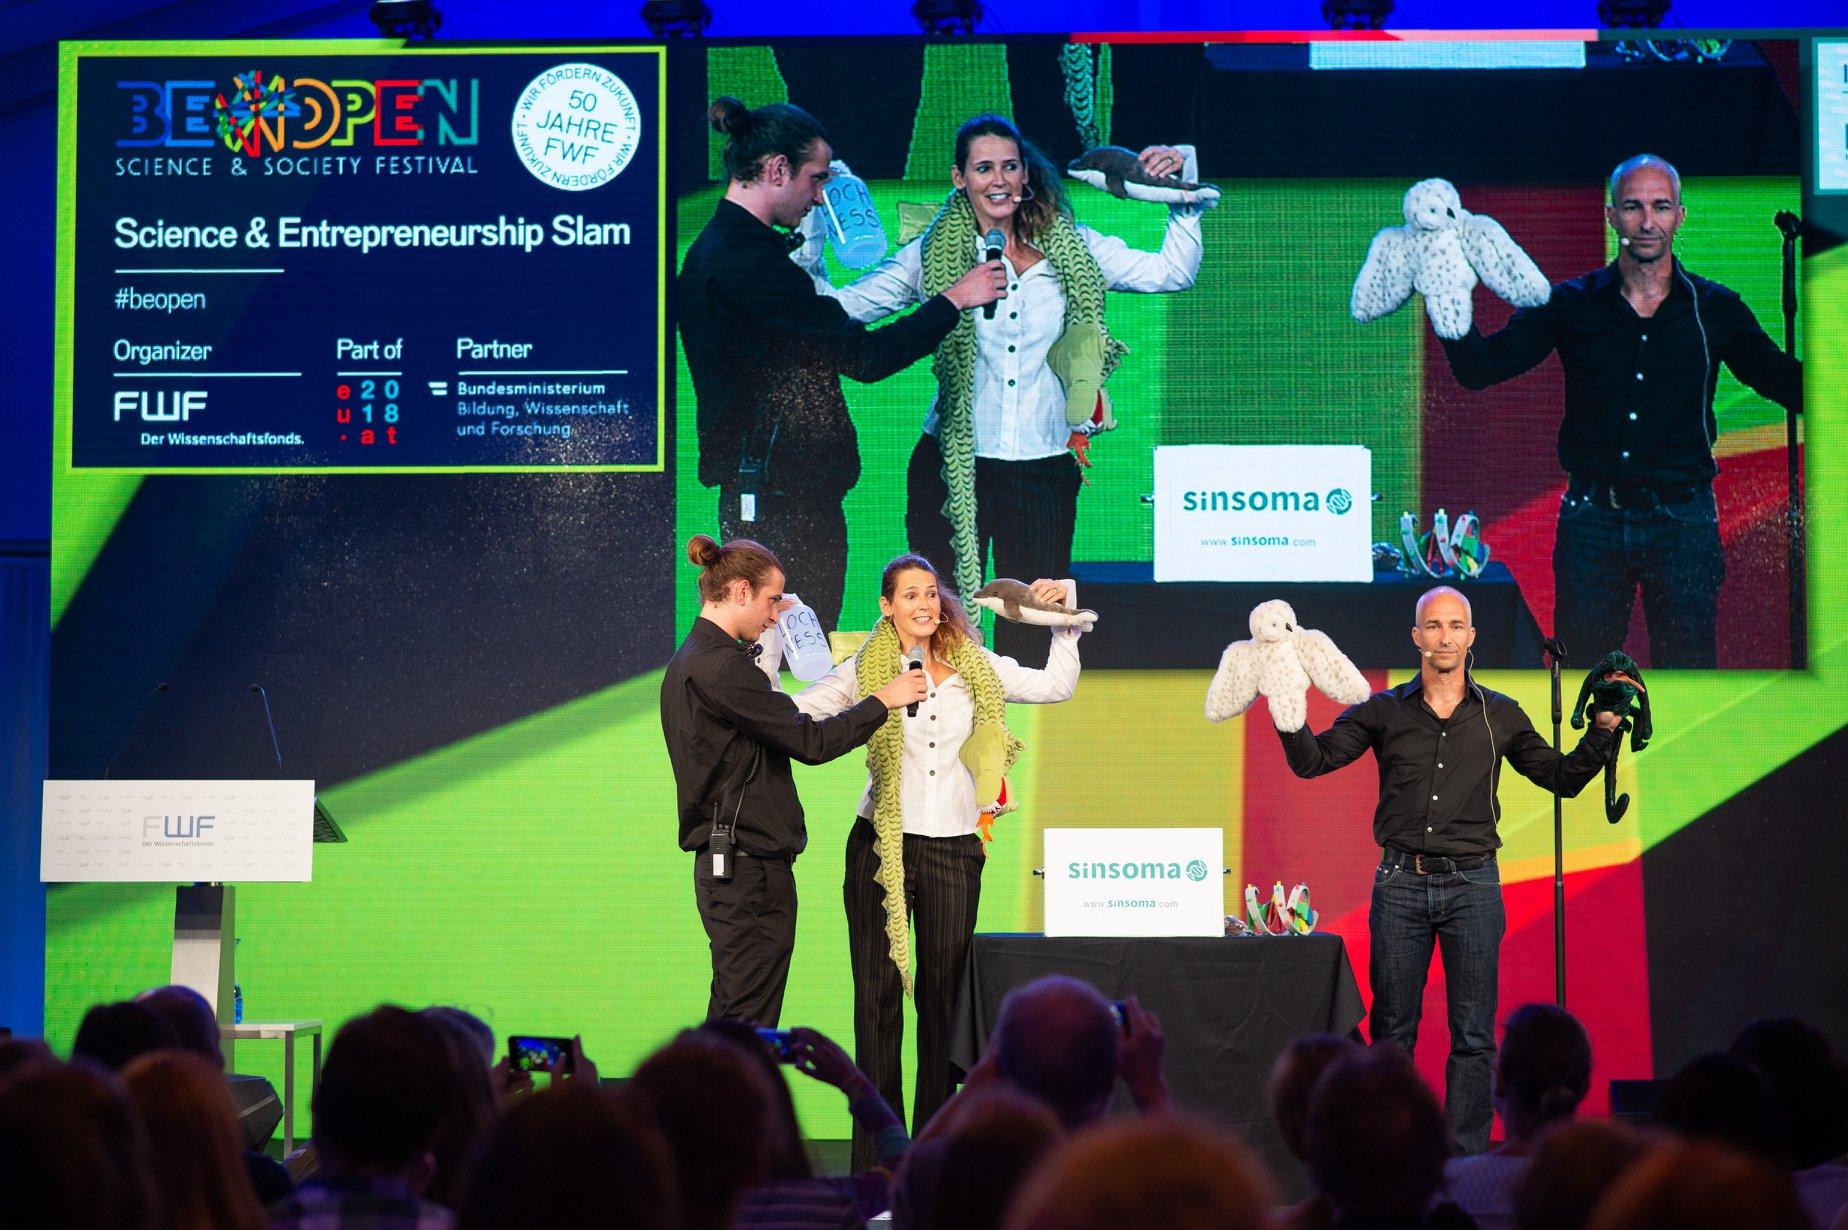 Science & Entrepreneurship Slam